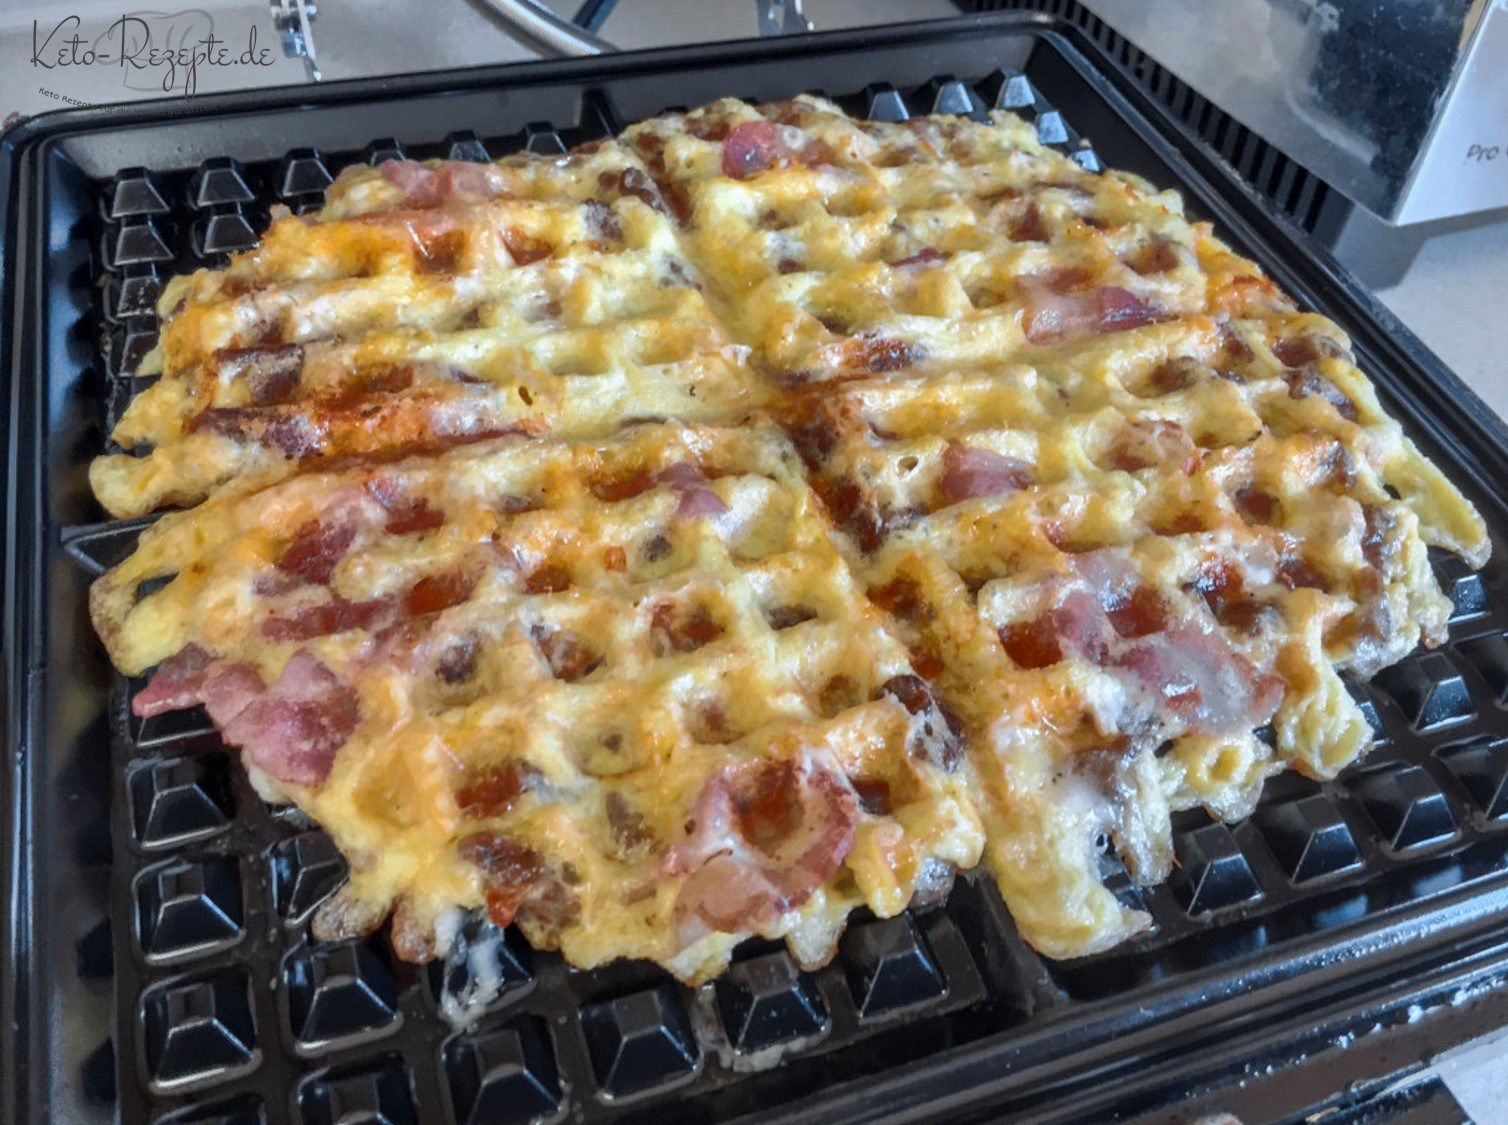 Keto Bacon-Käse Waffeln   keto-rezepte.de